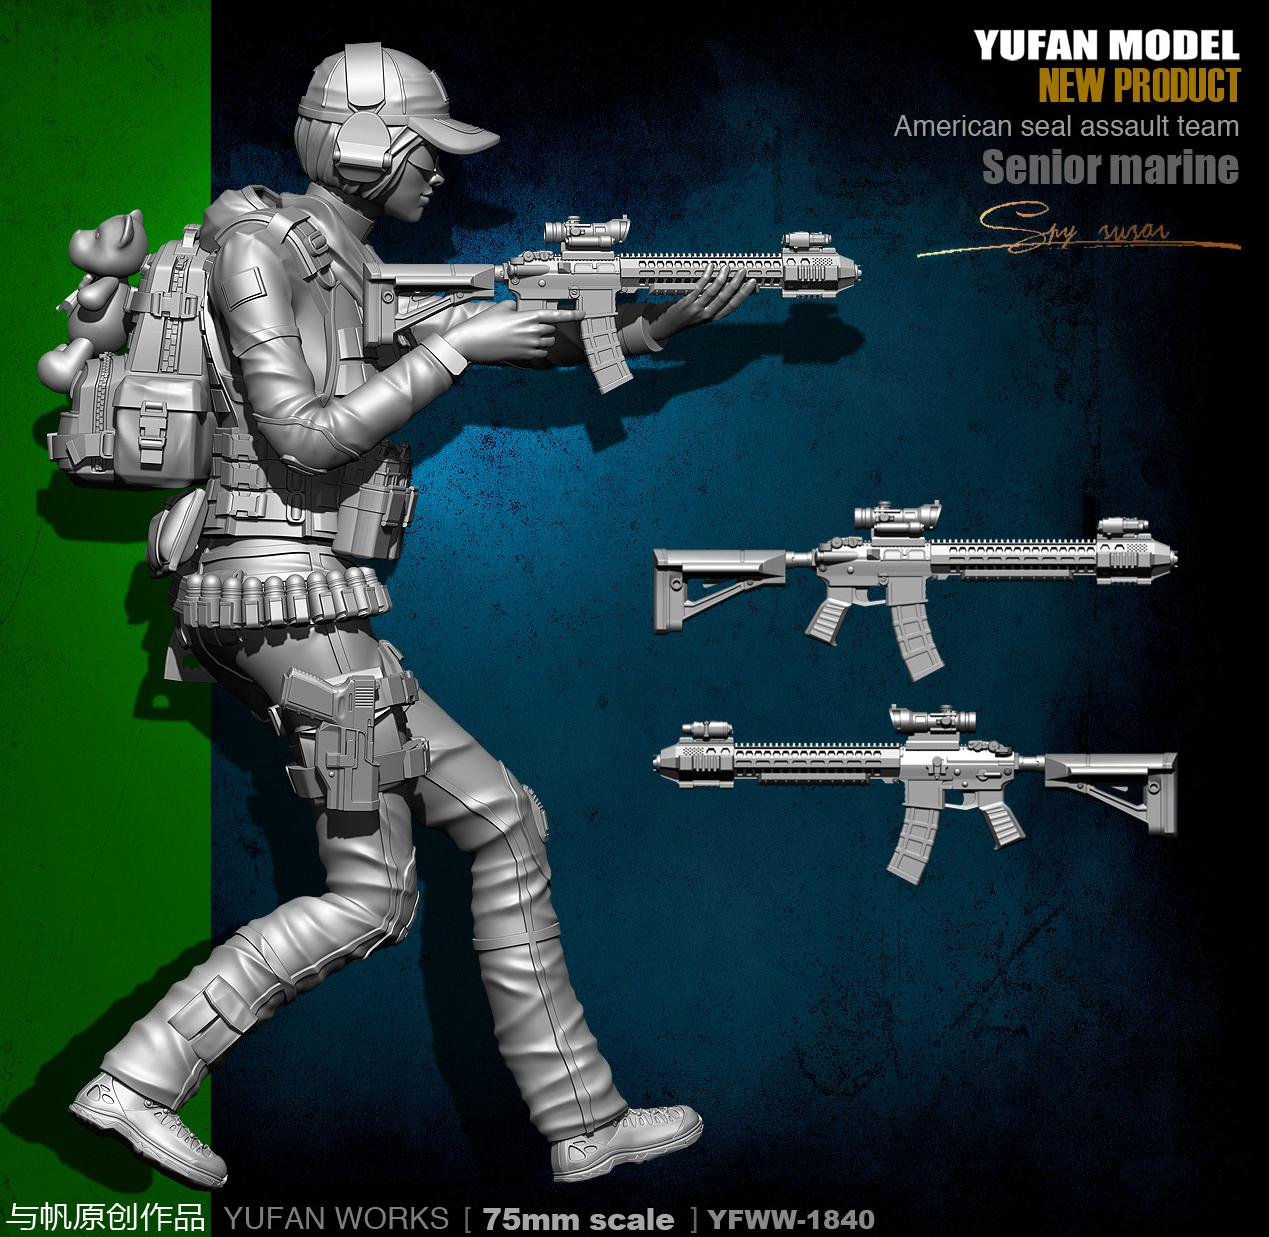 Yufan Model Original 75mm 1/24 Figure Female Seals Resin Soldier YFWW-1840